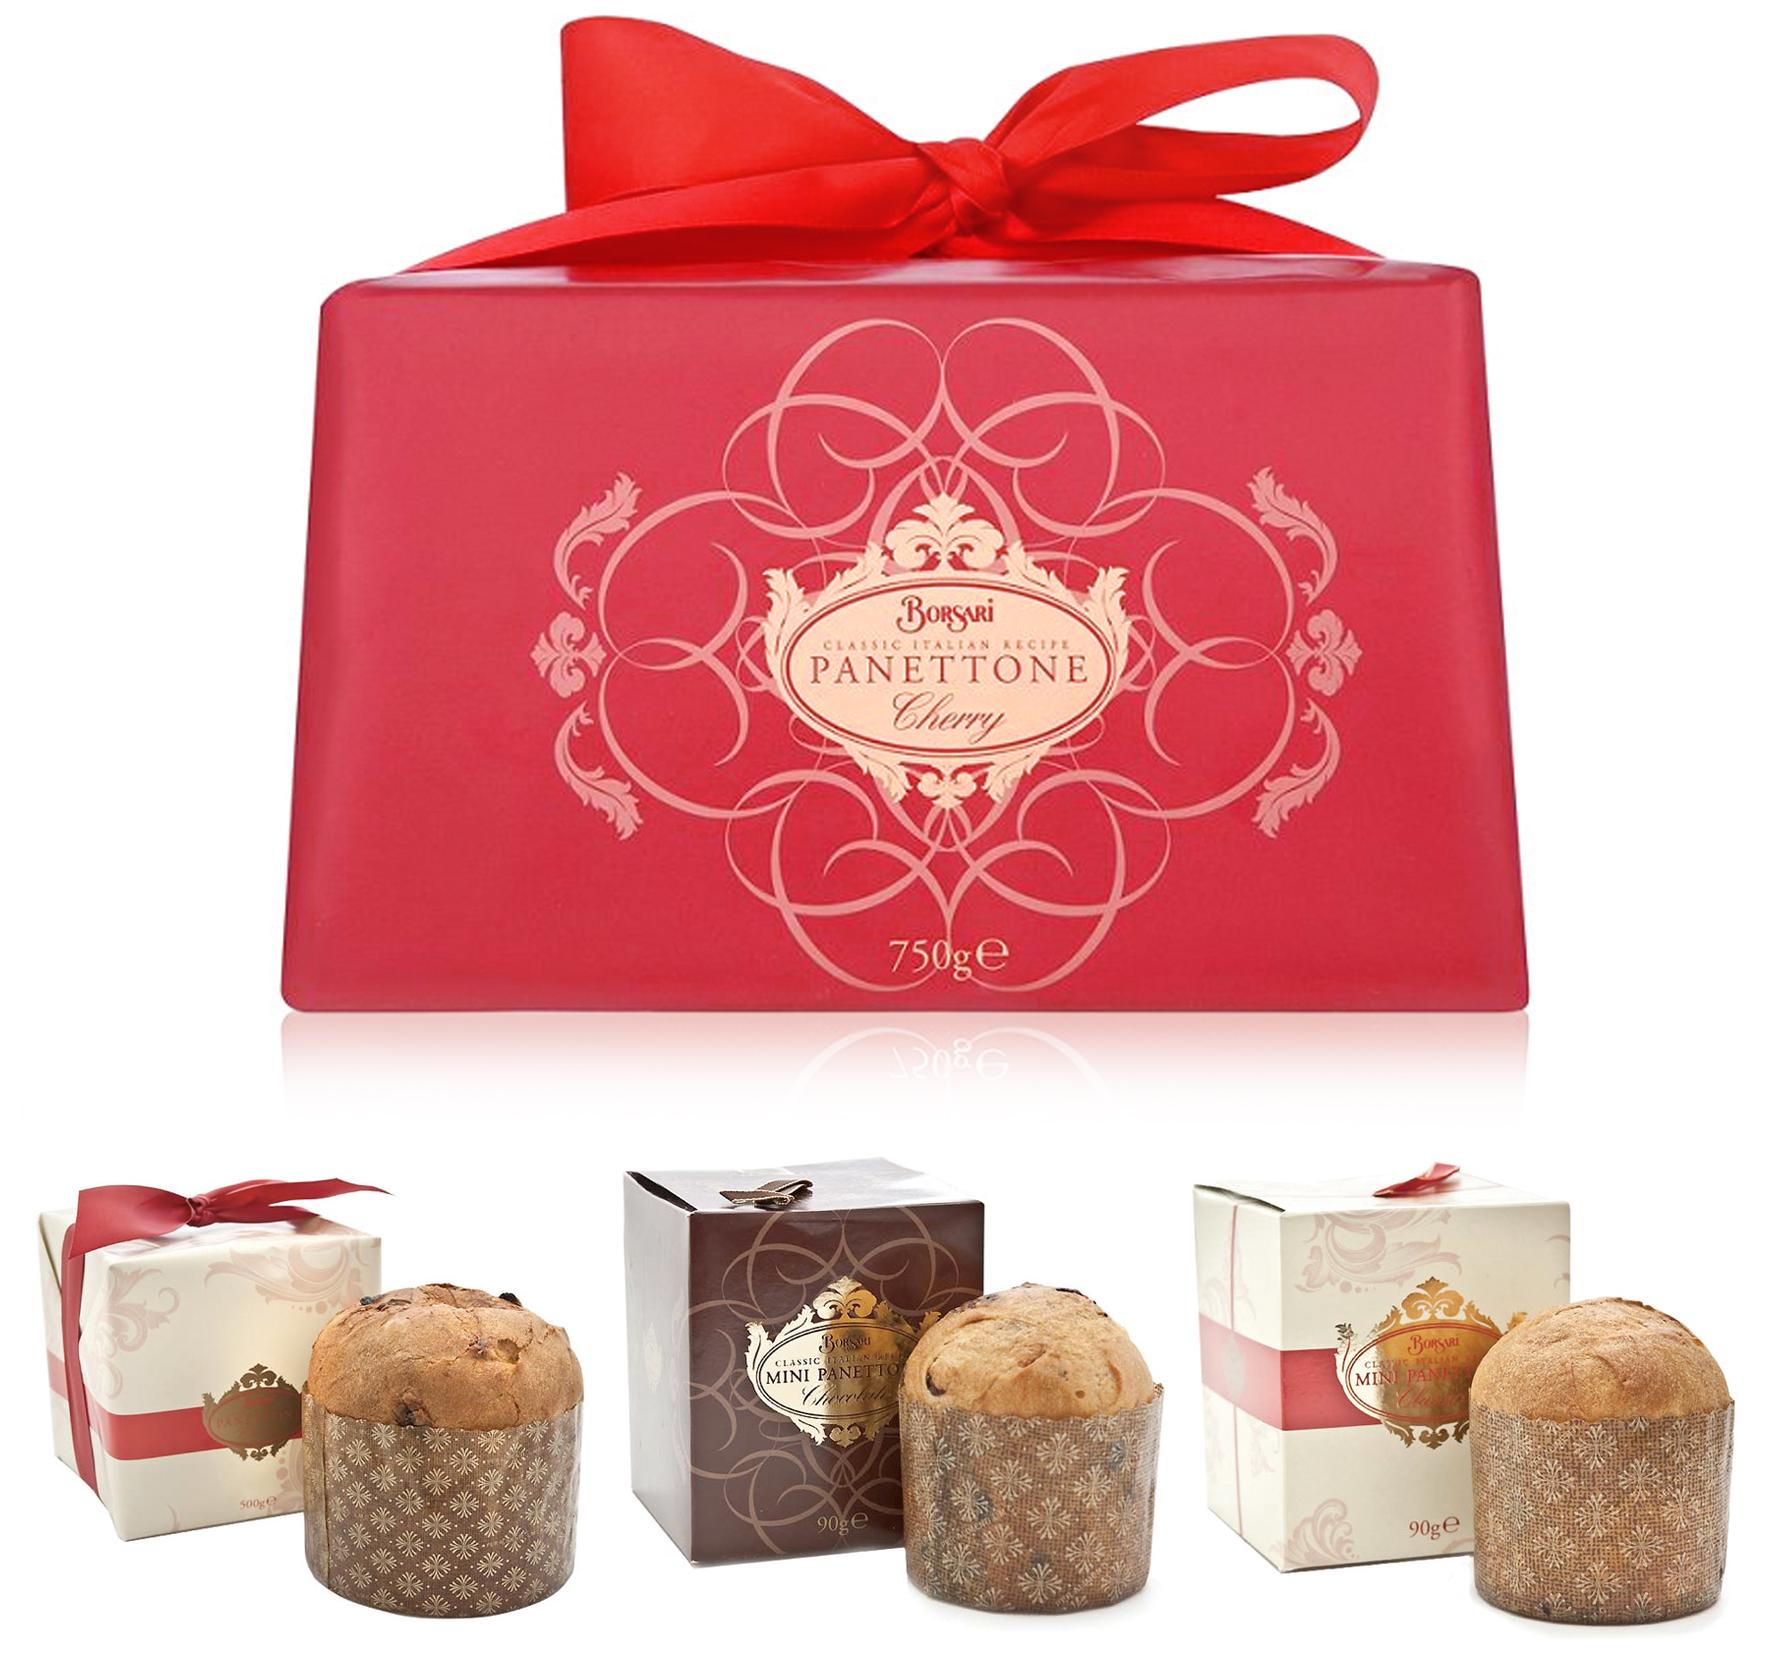 Borsari Panettone range packaging